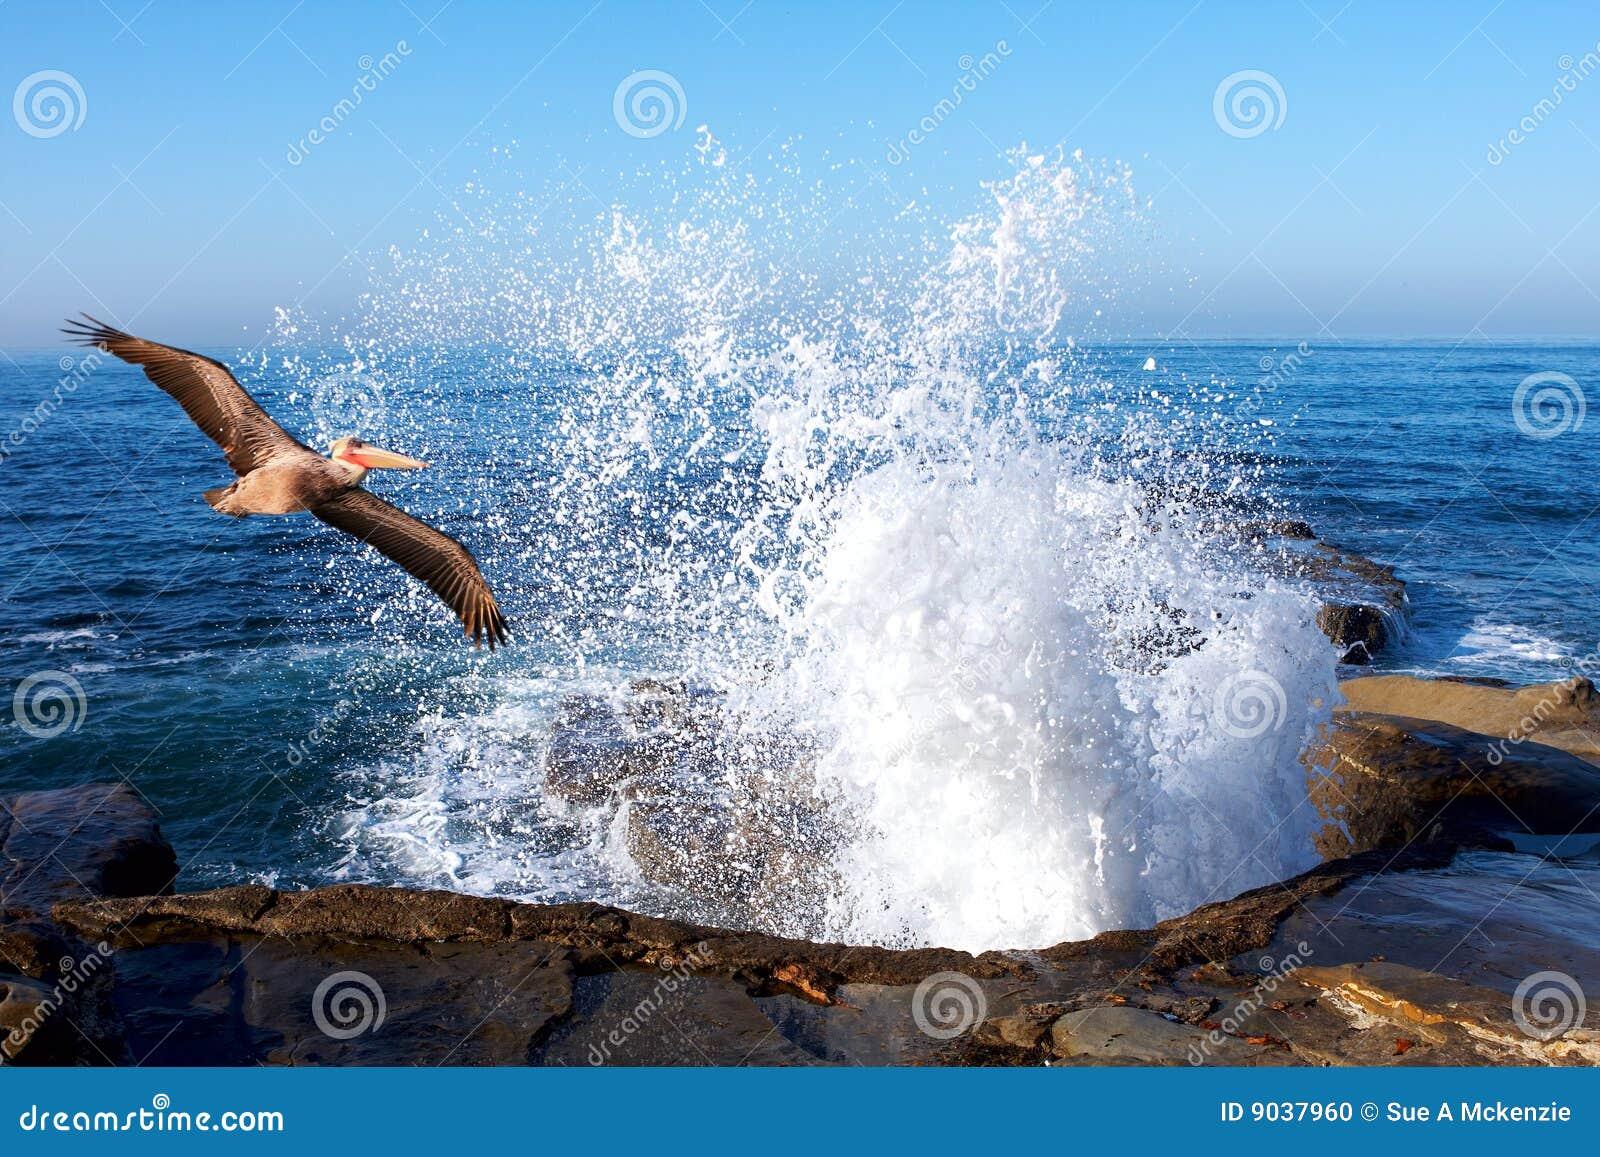 Pelican Soaring Through Splashing Ocean Waves